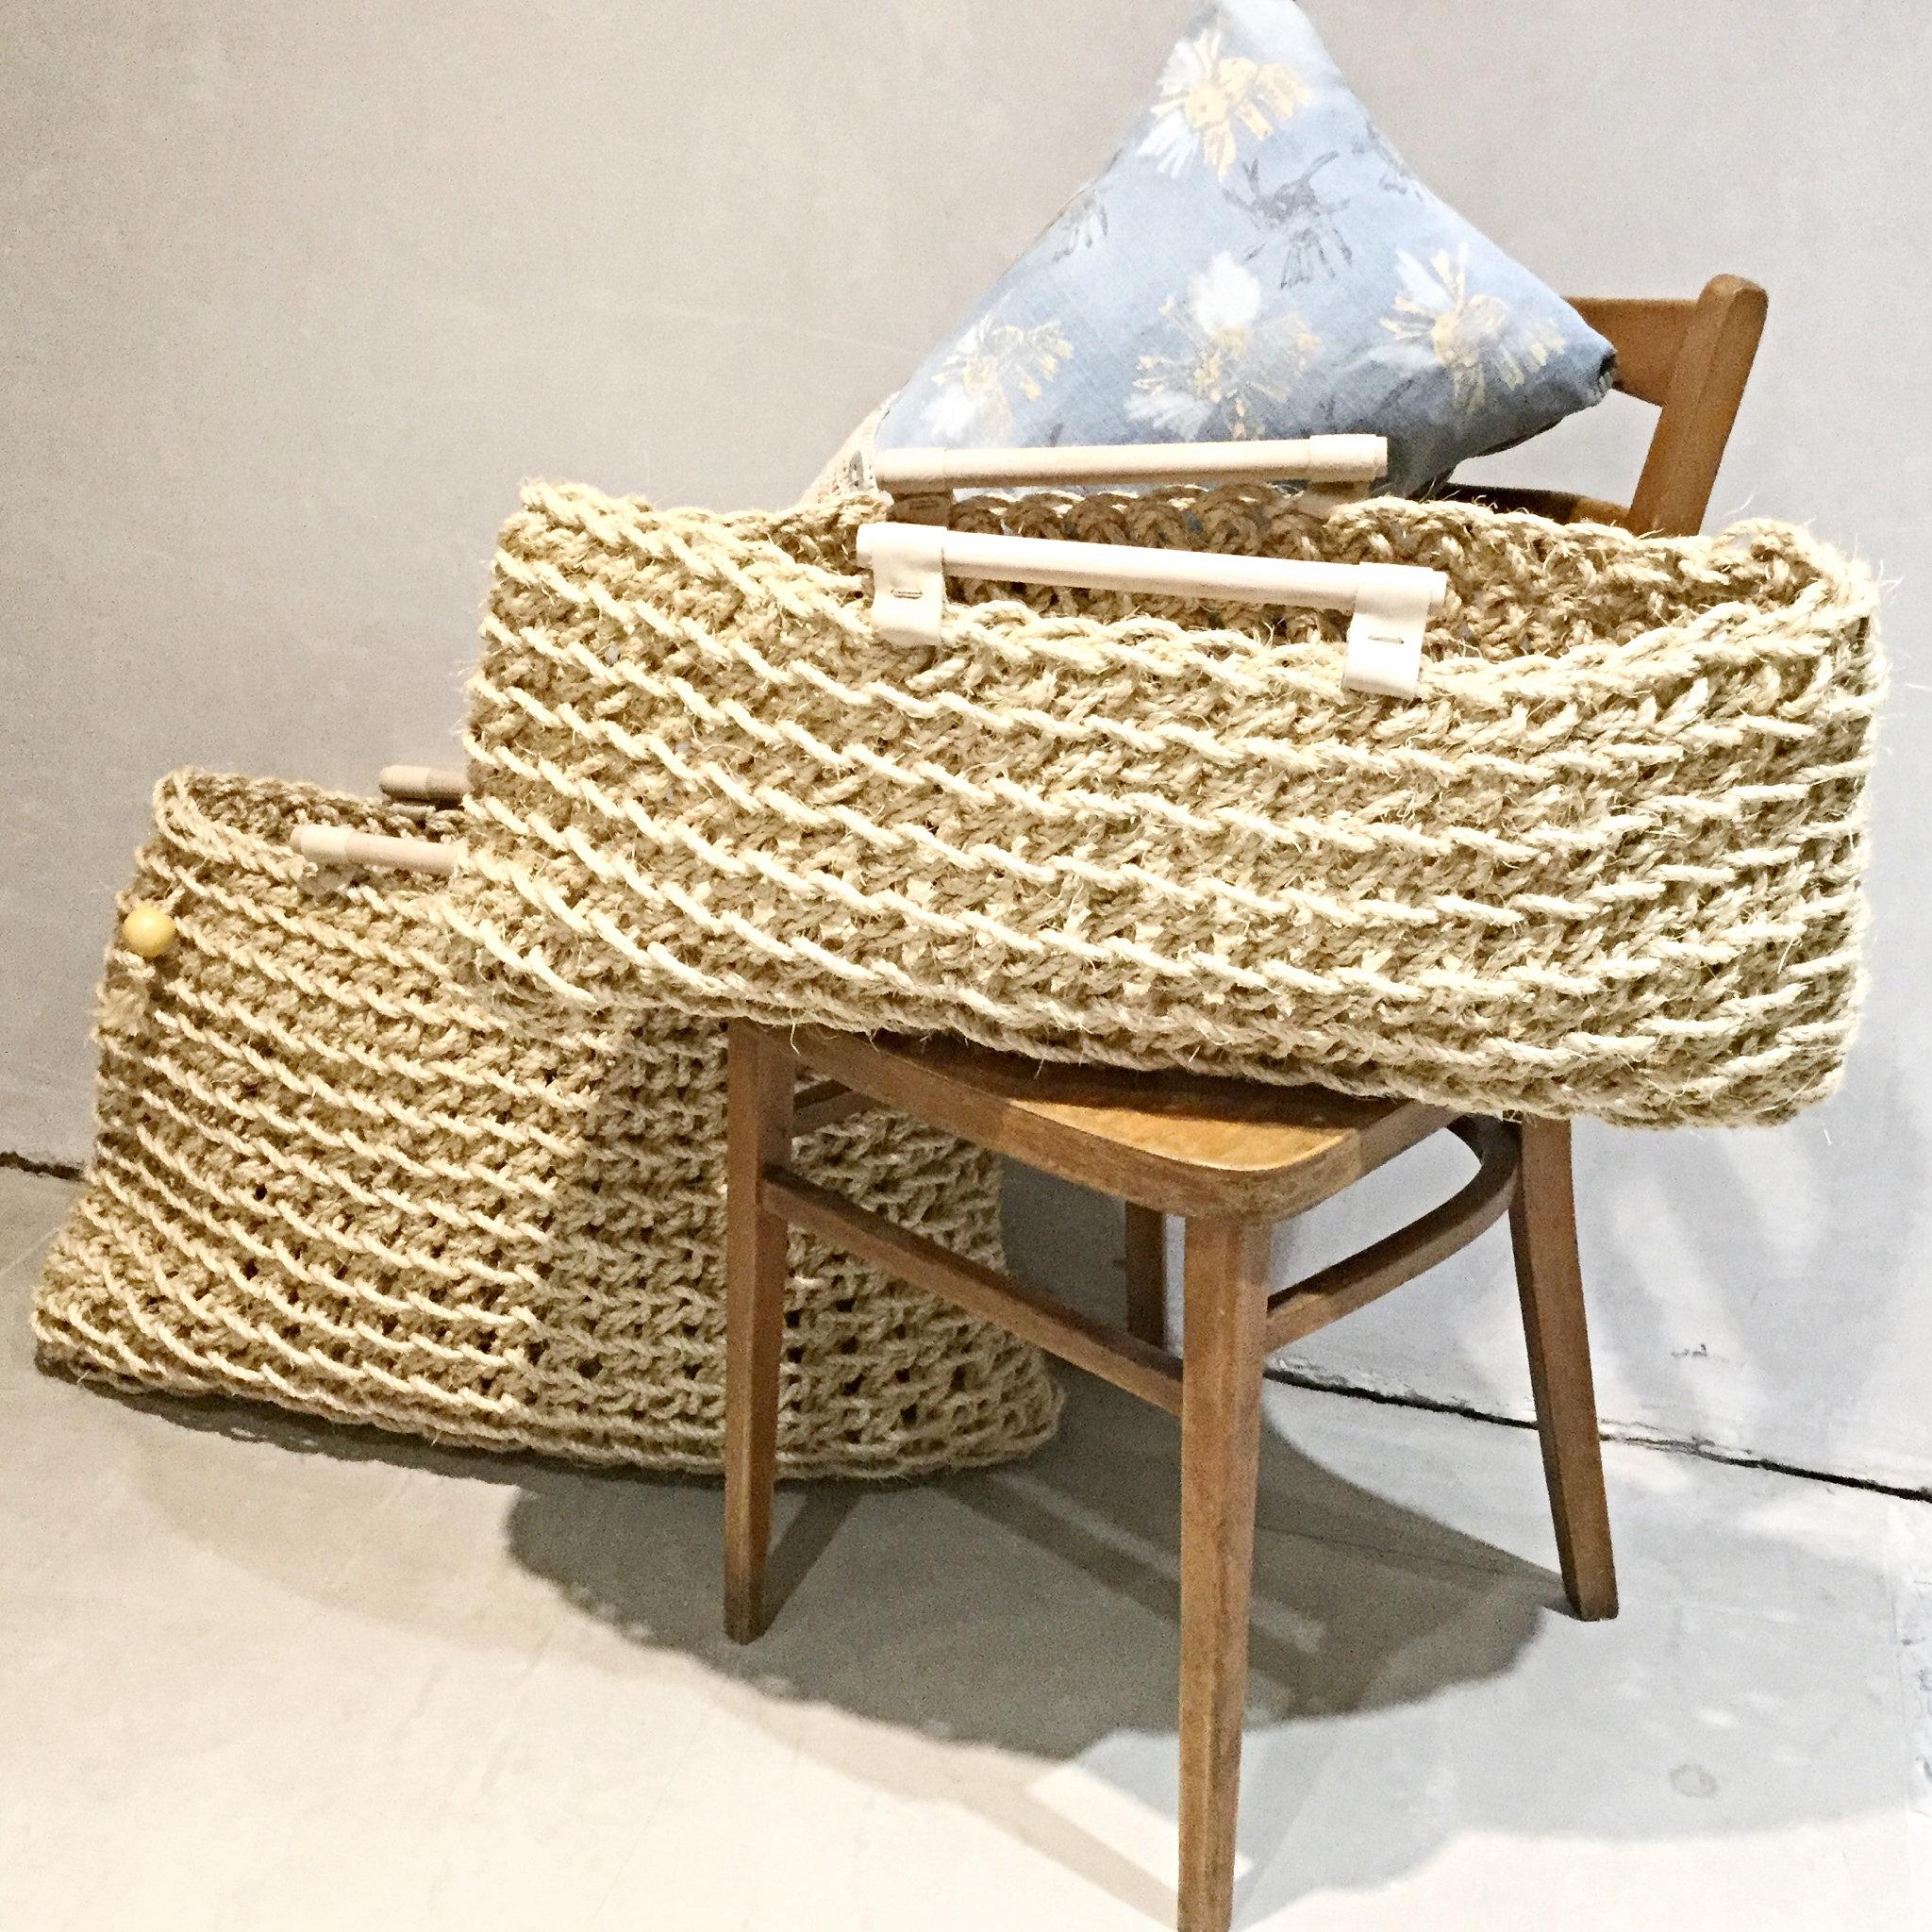 large sisal rope basket - Sisal Rope